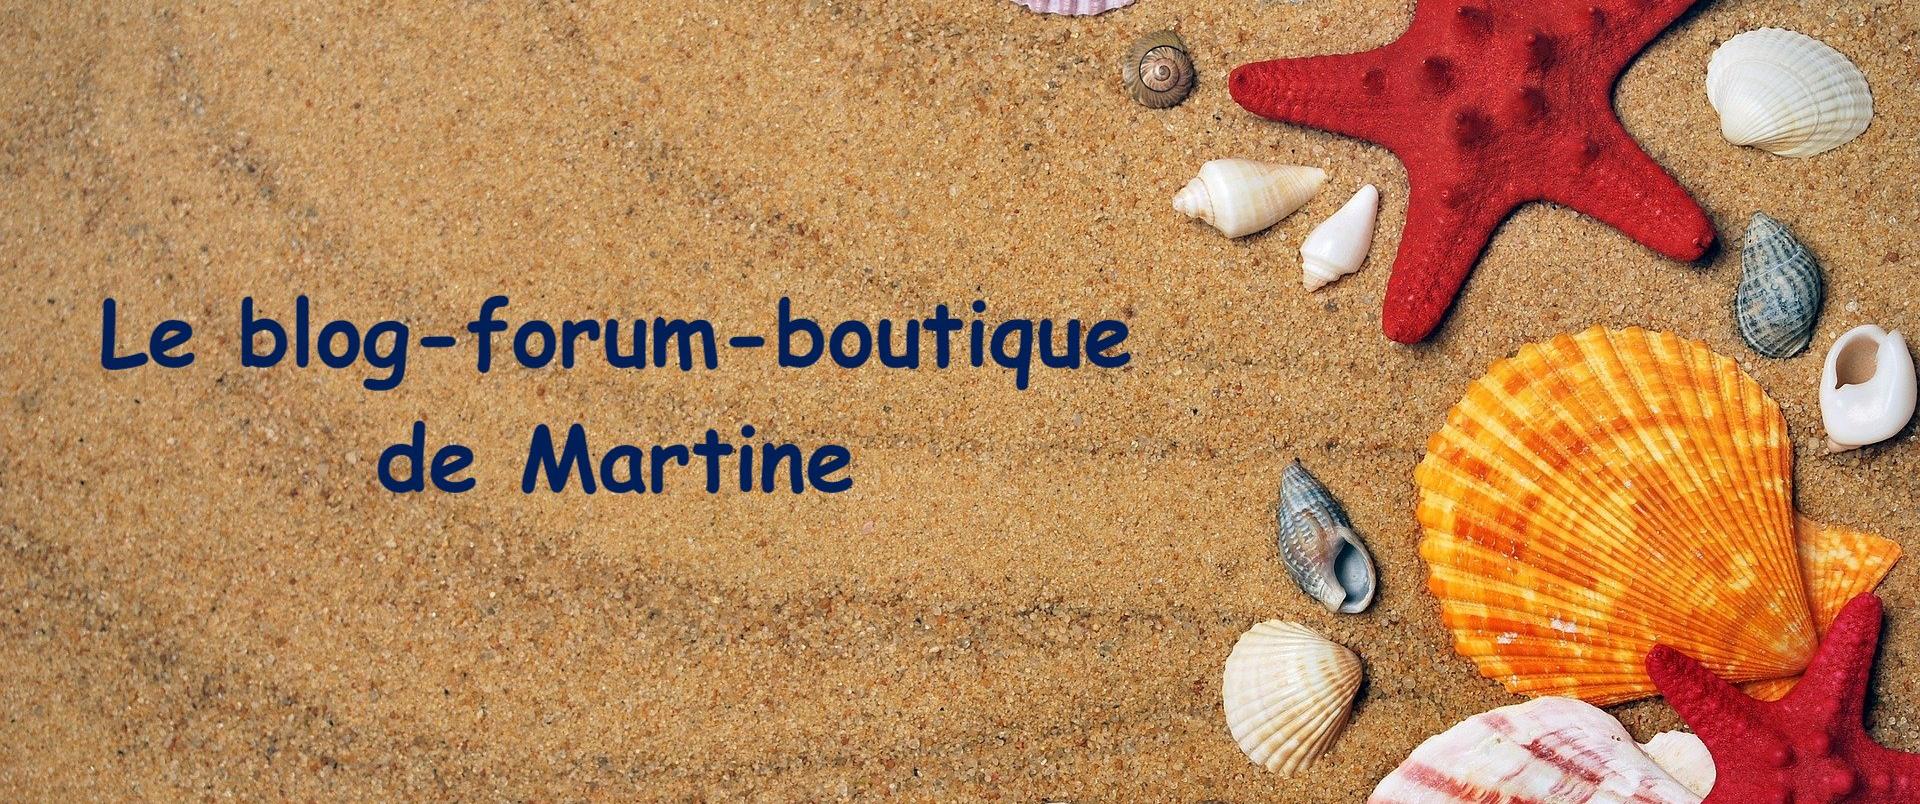 Le site de Martine